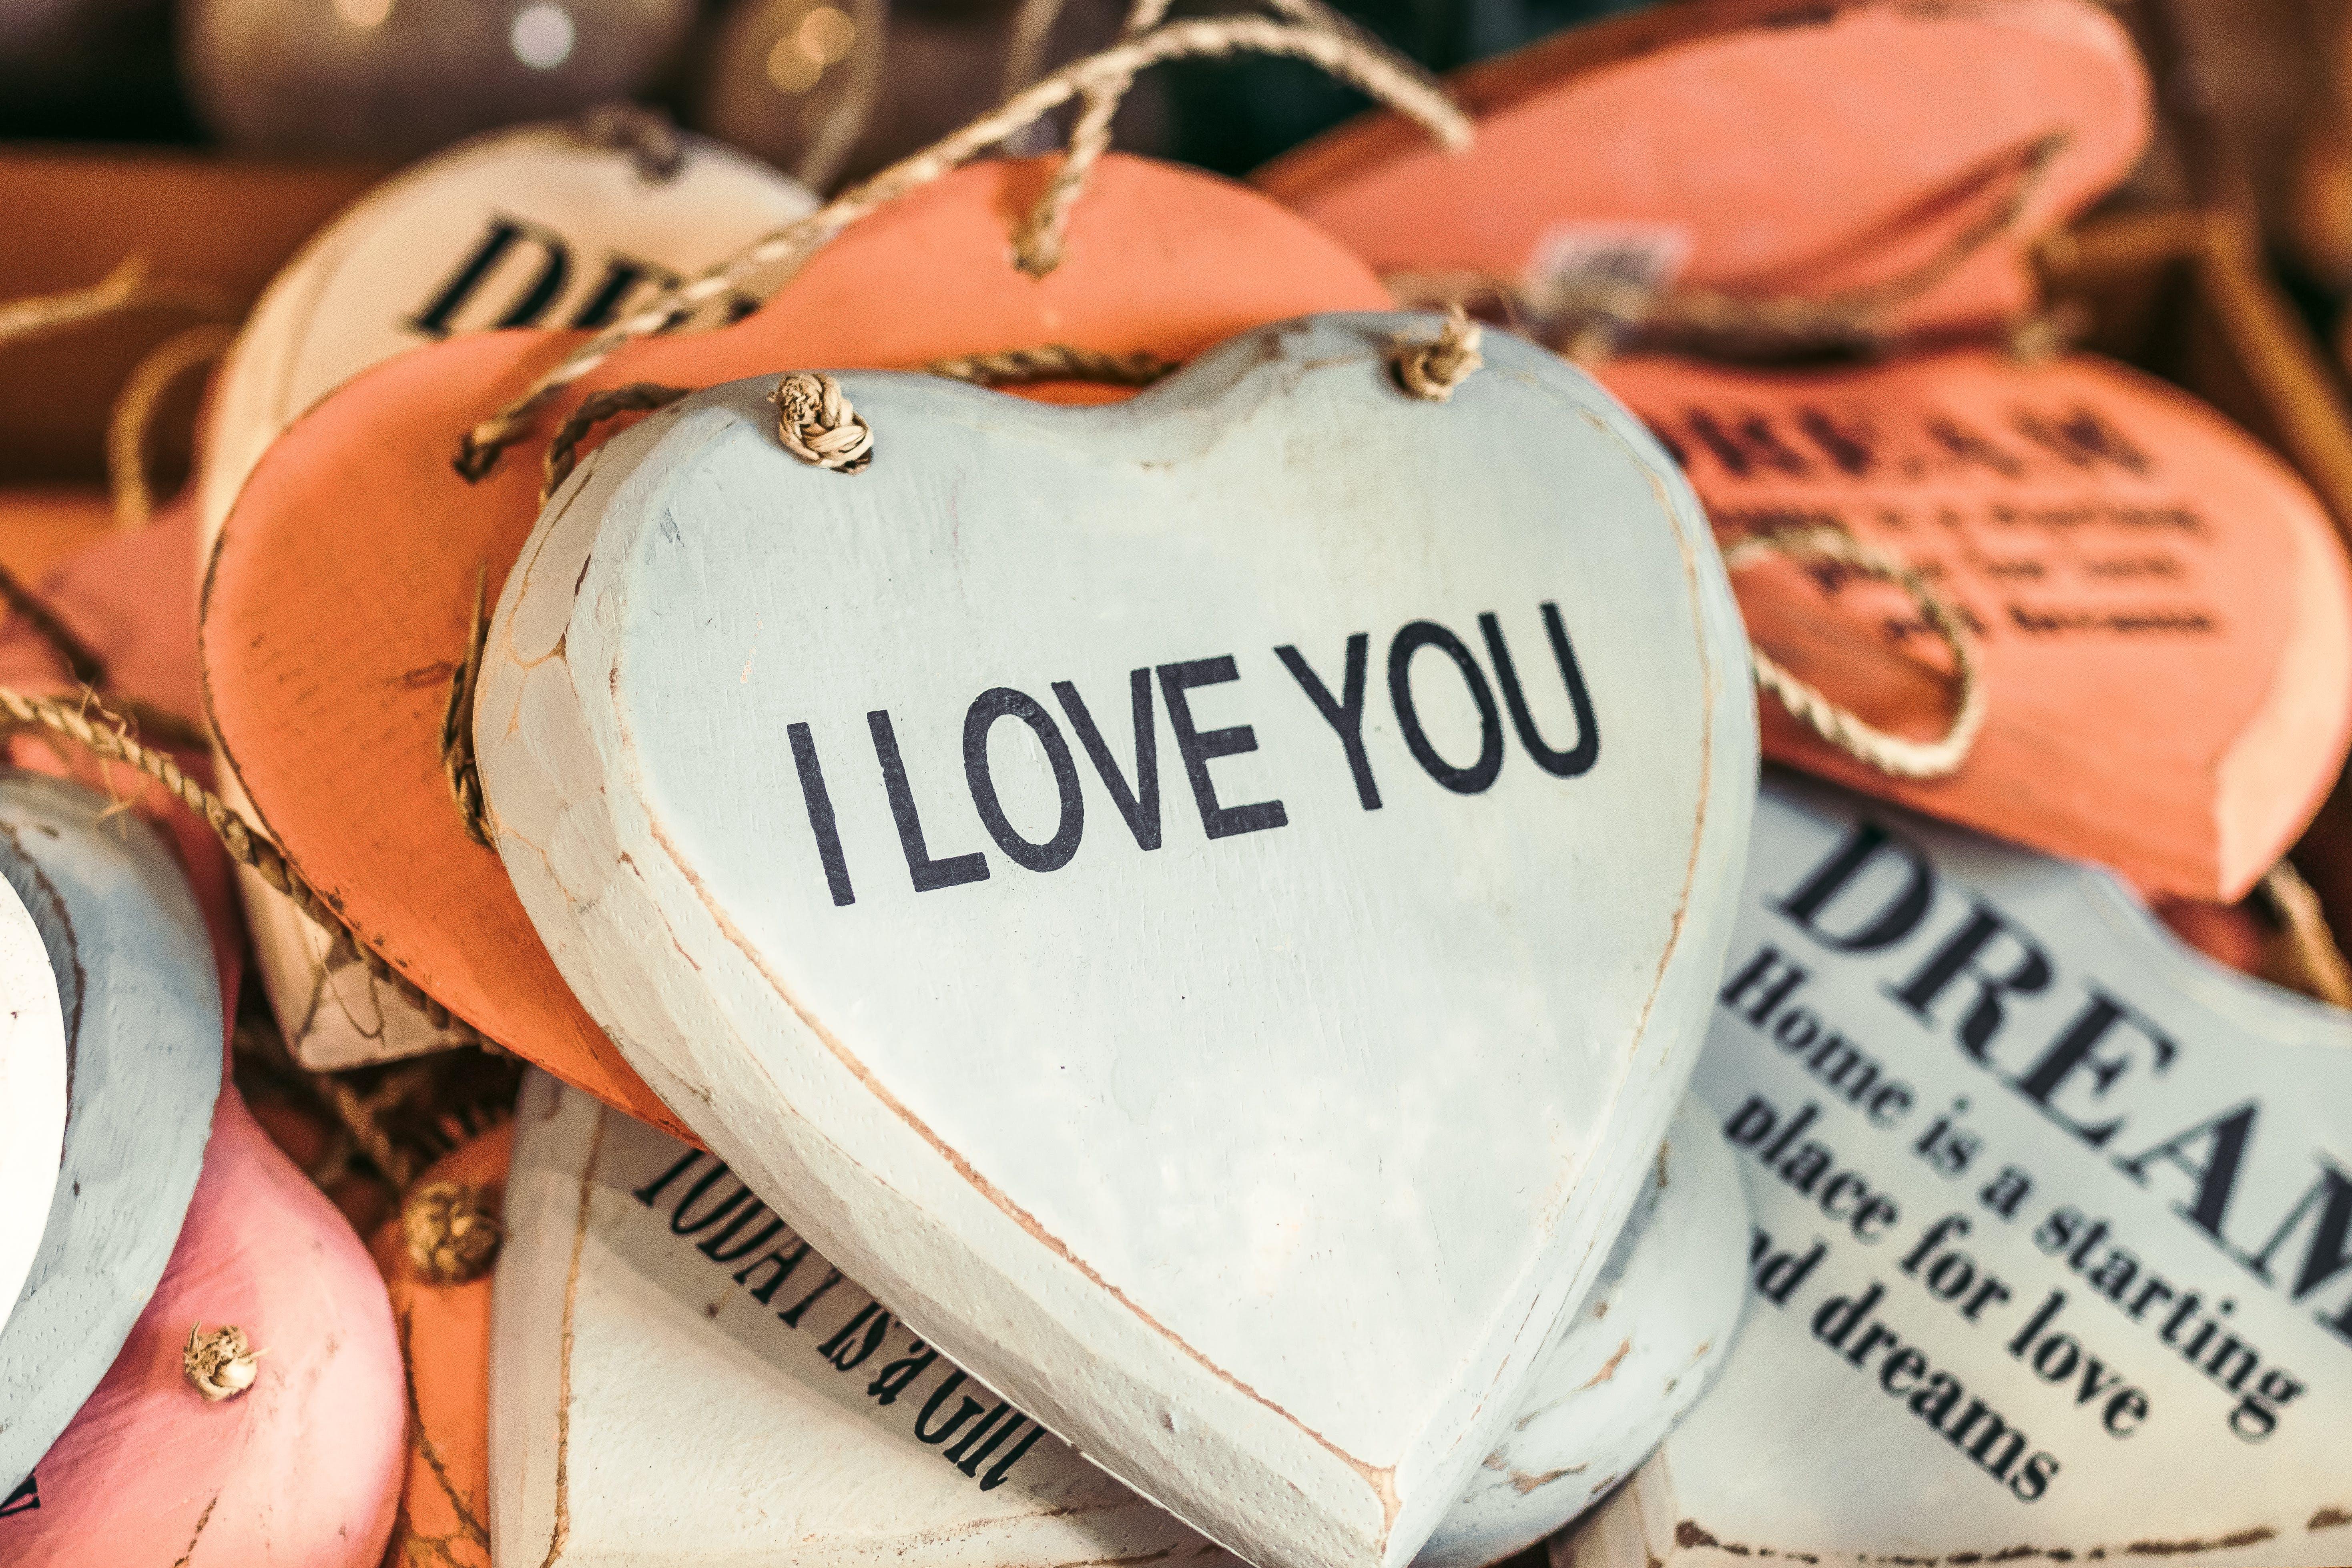 Heart-shape White and Black I Love You-printed Decorative Board